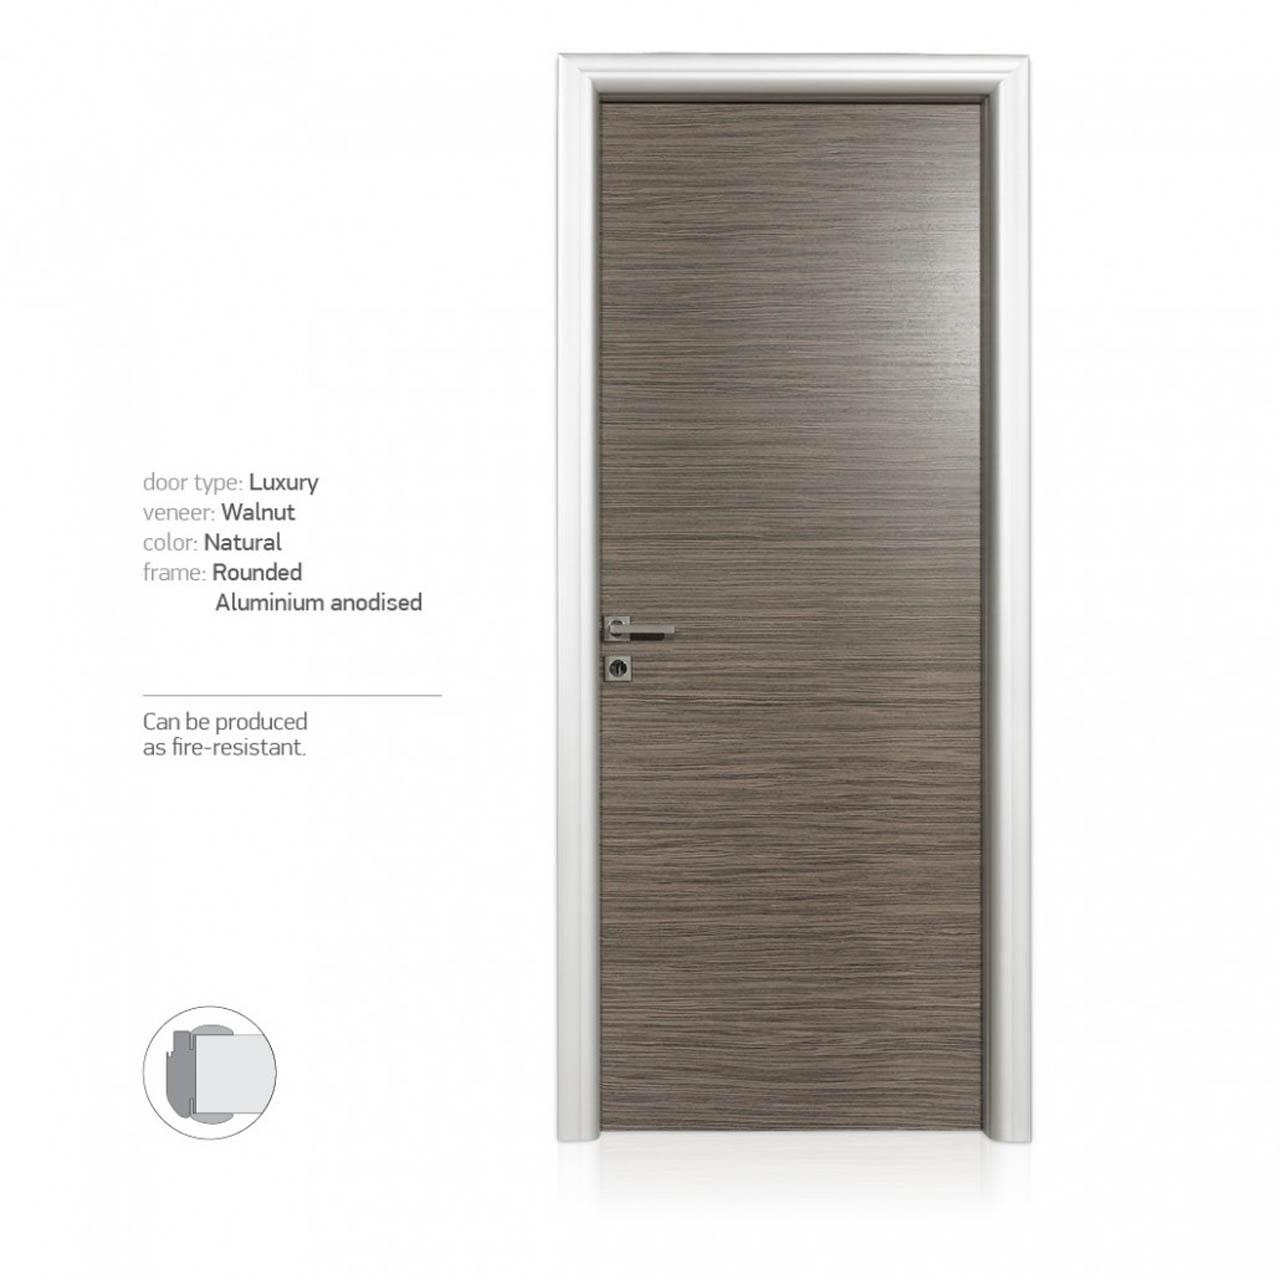 portes-site-luxury-eng10-1030x1030